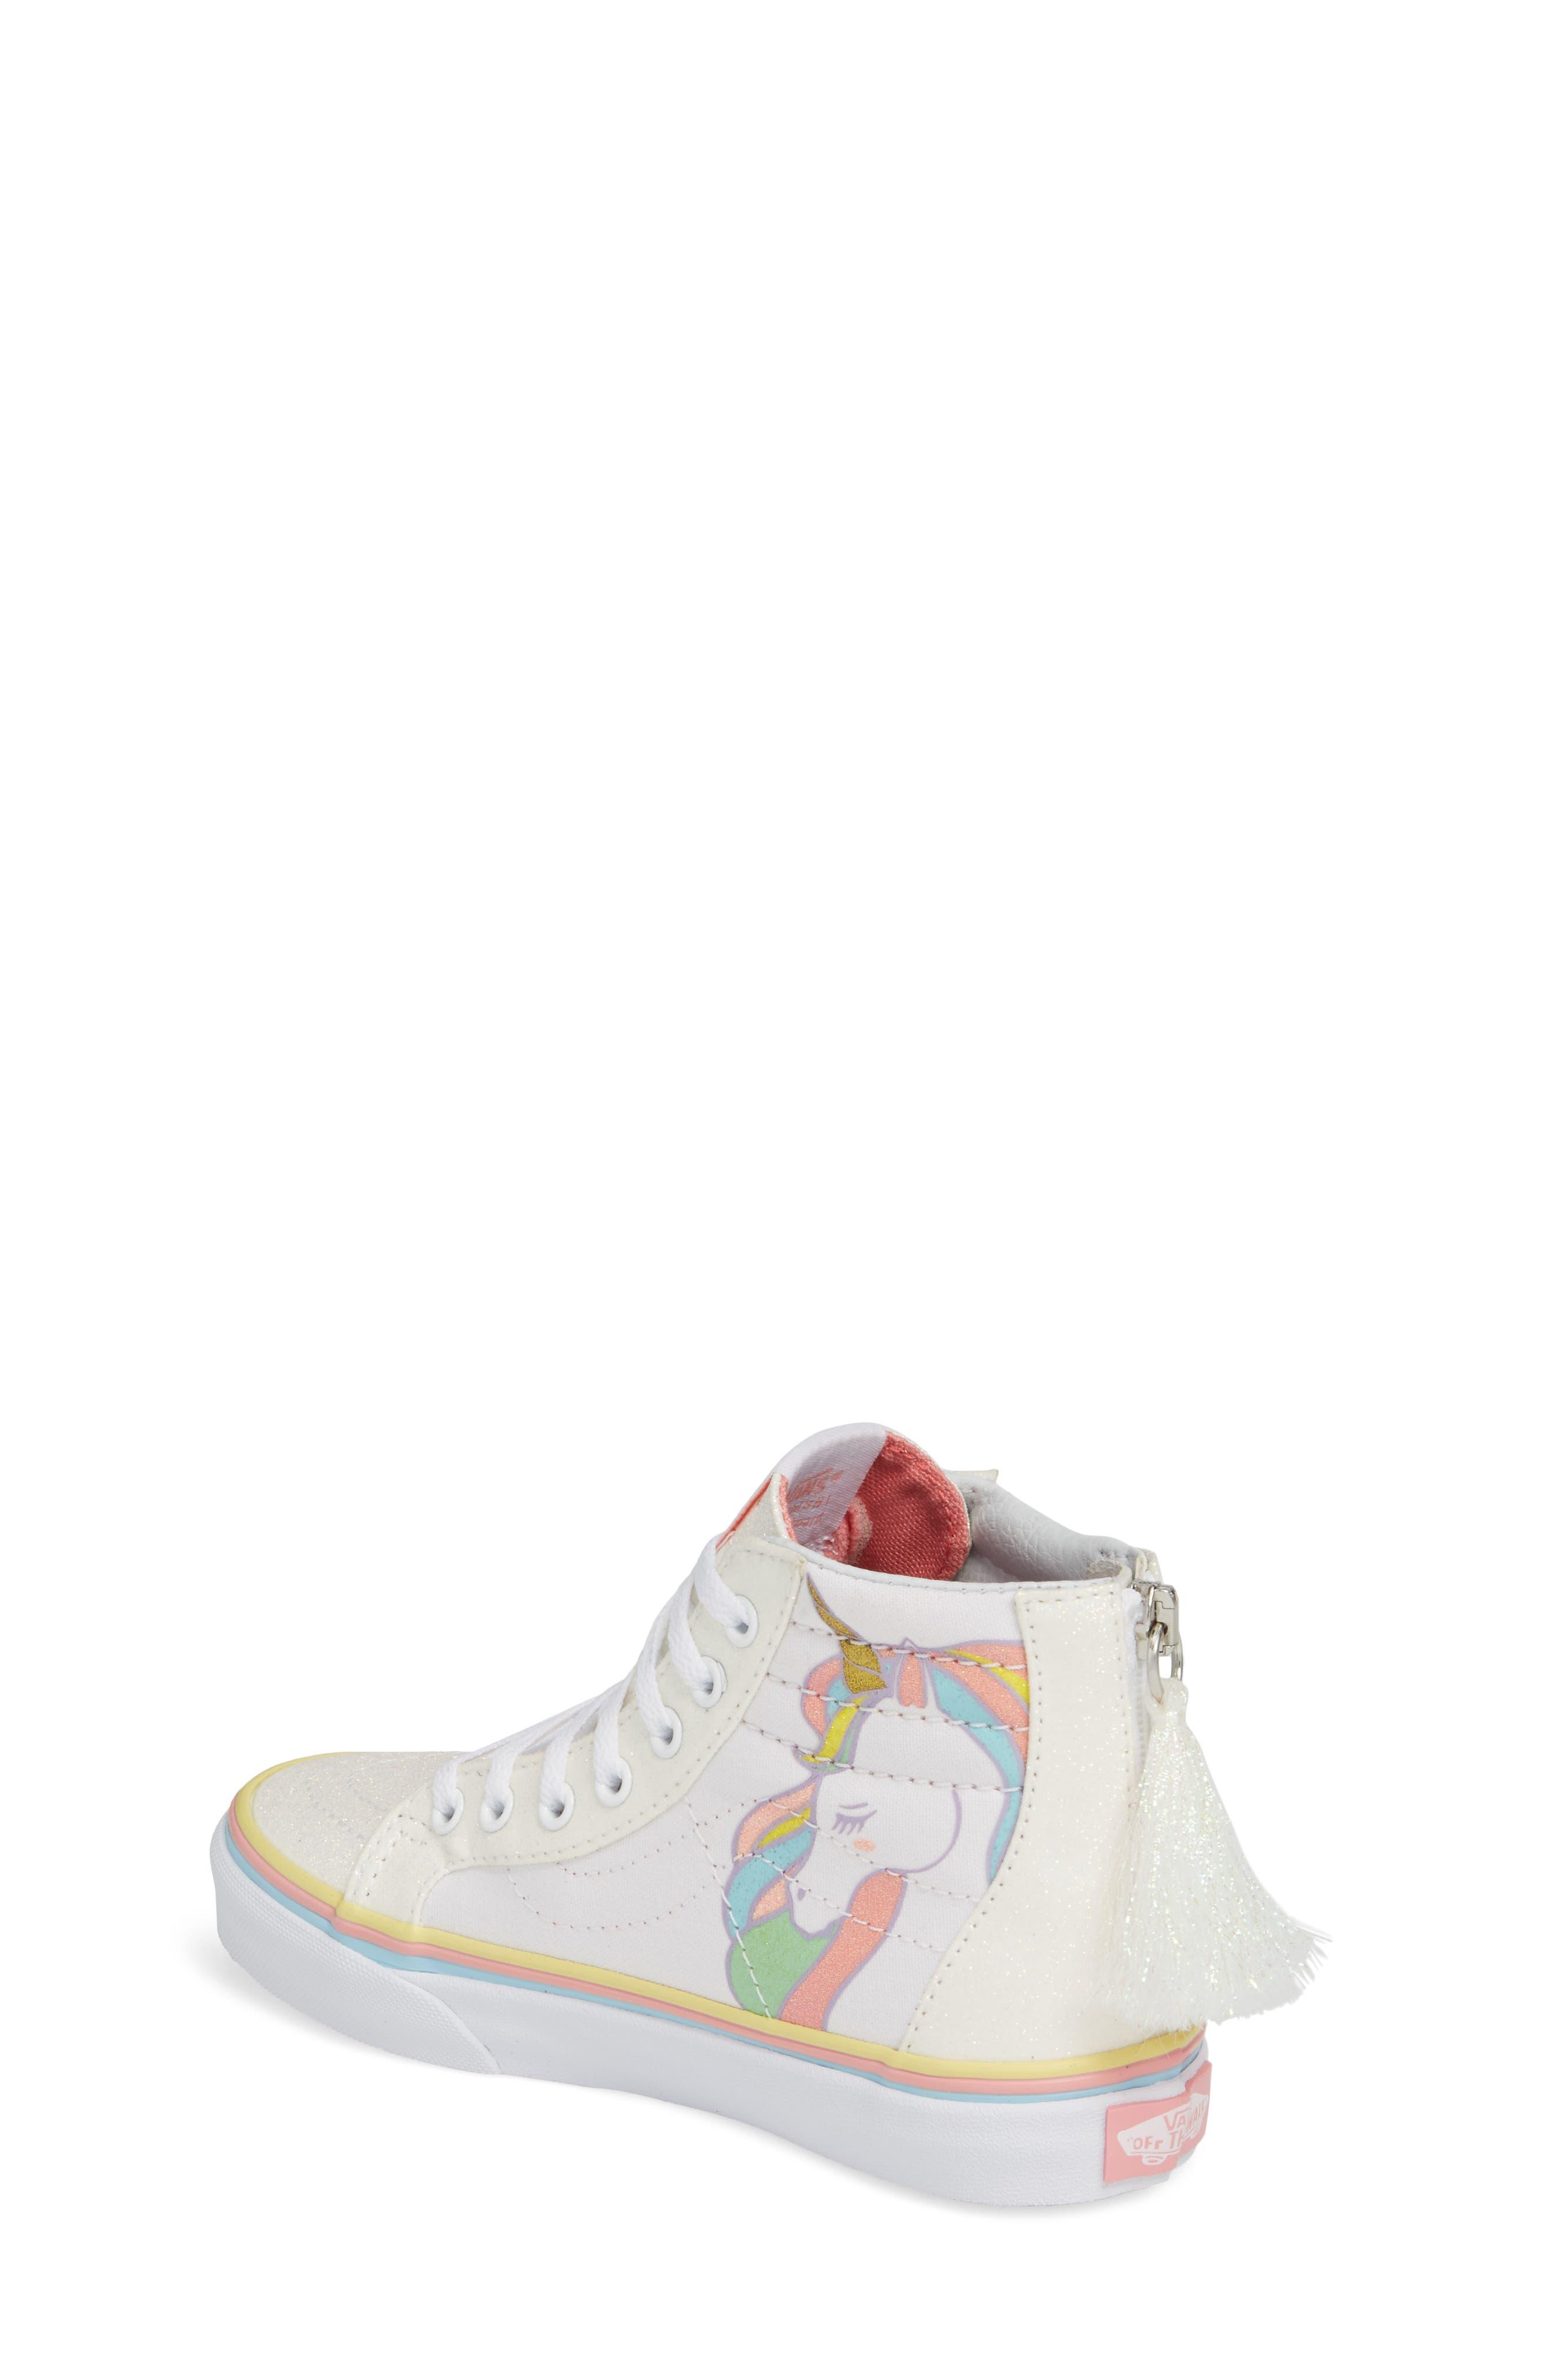 Sk8-Hi Zip Unicorn Glitter High Top Sneaker,                             Alternate thumbnail 2, color,                             White Glitter Unicorn